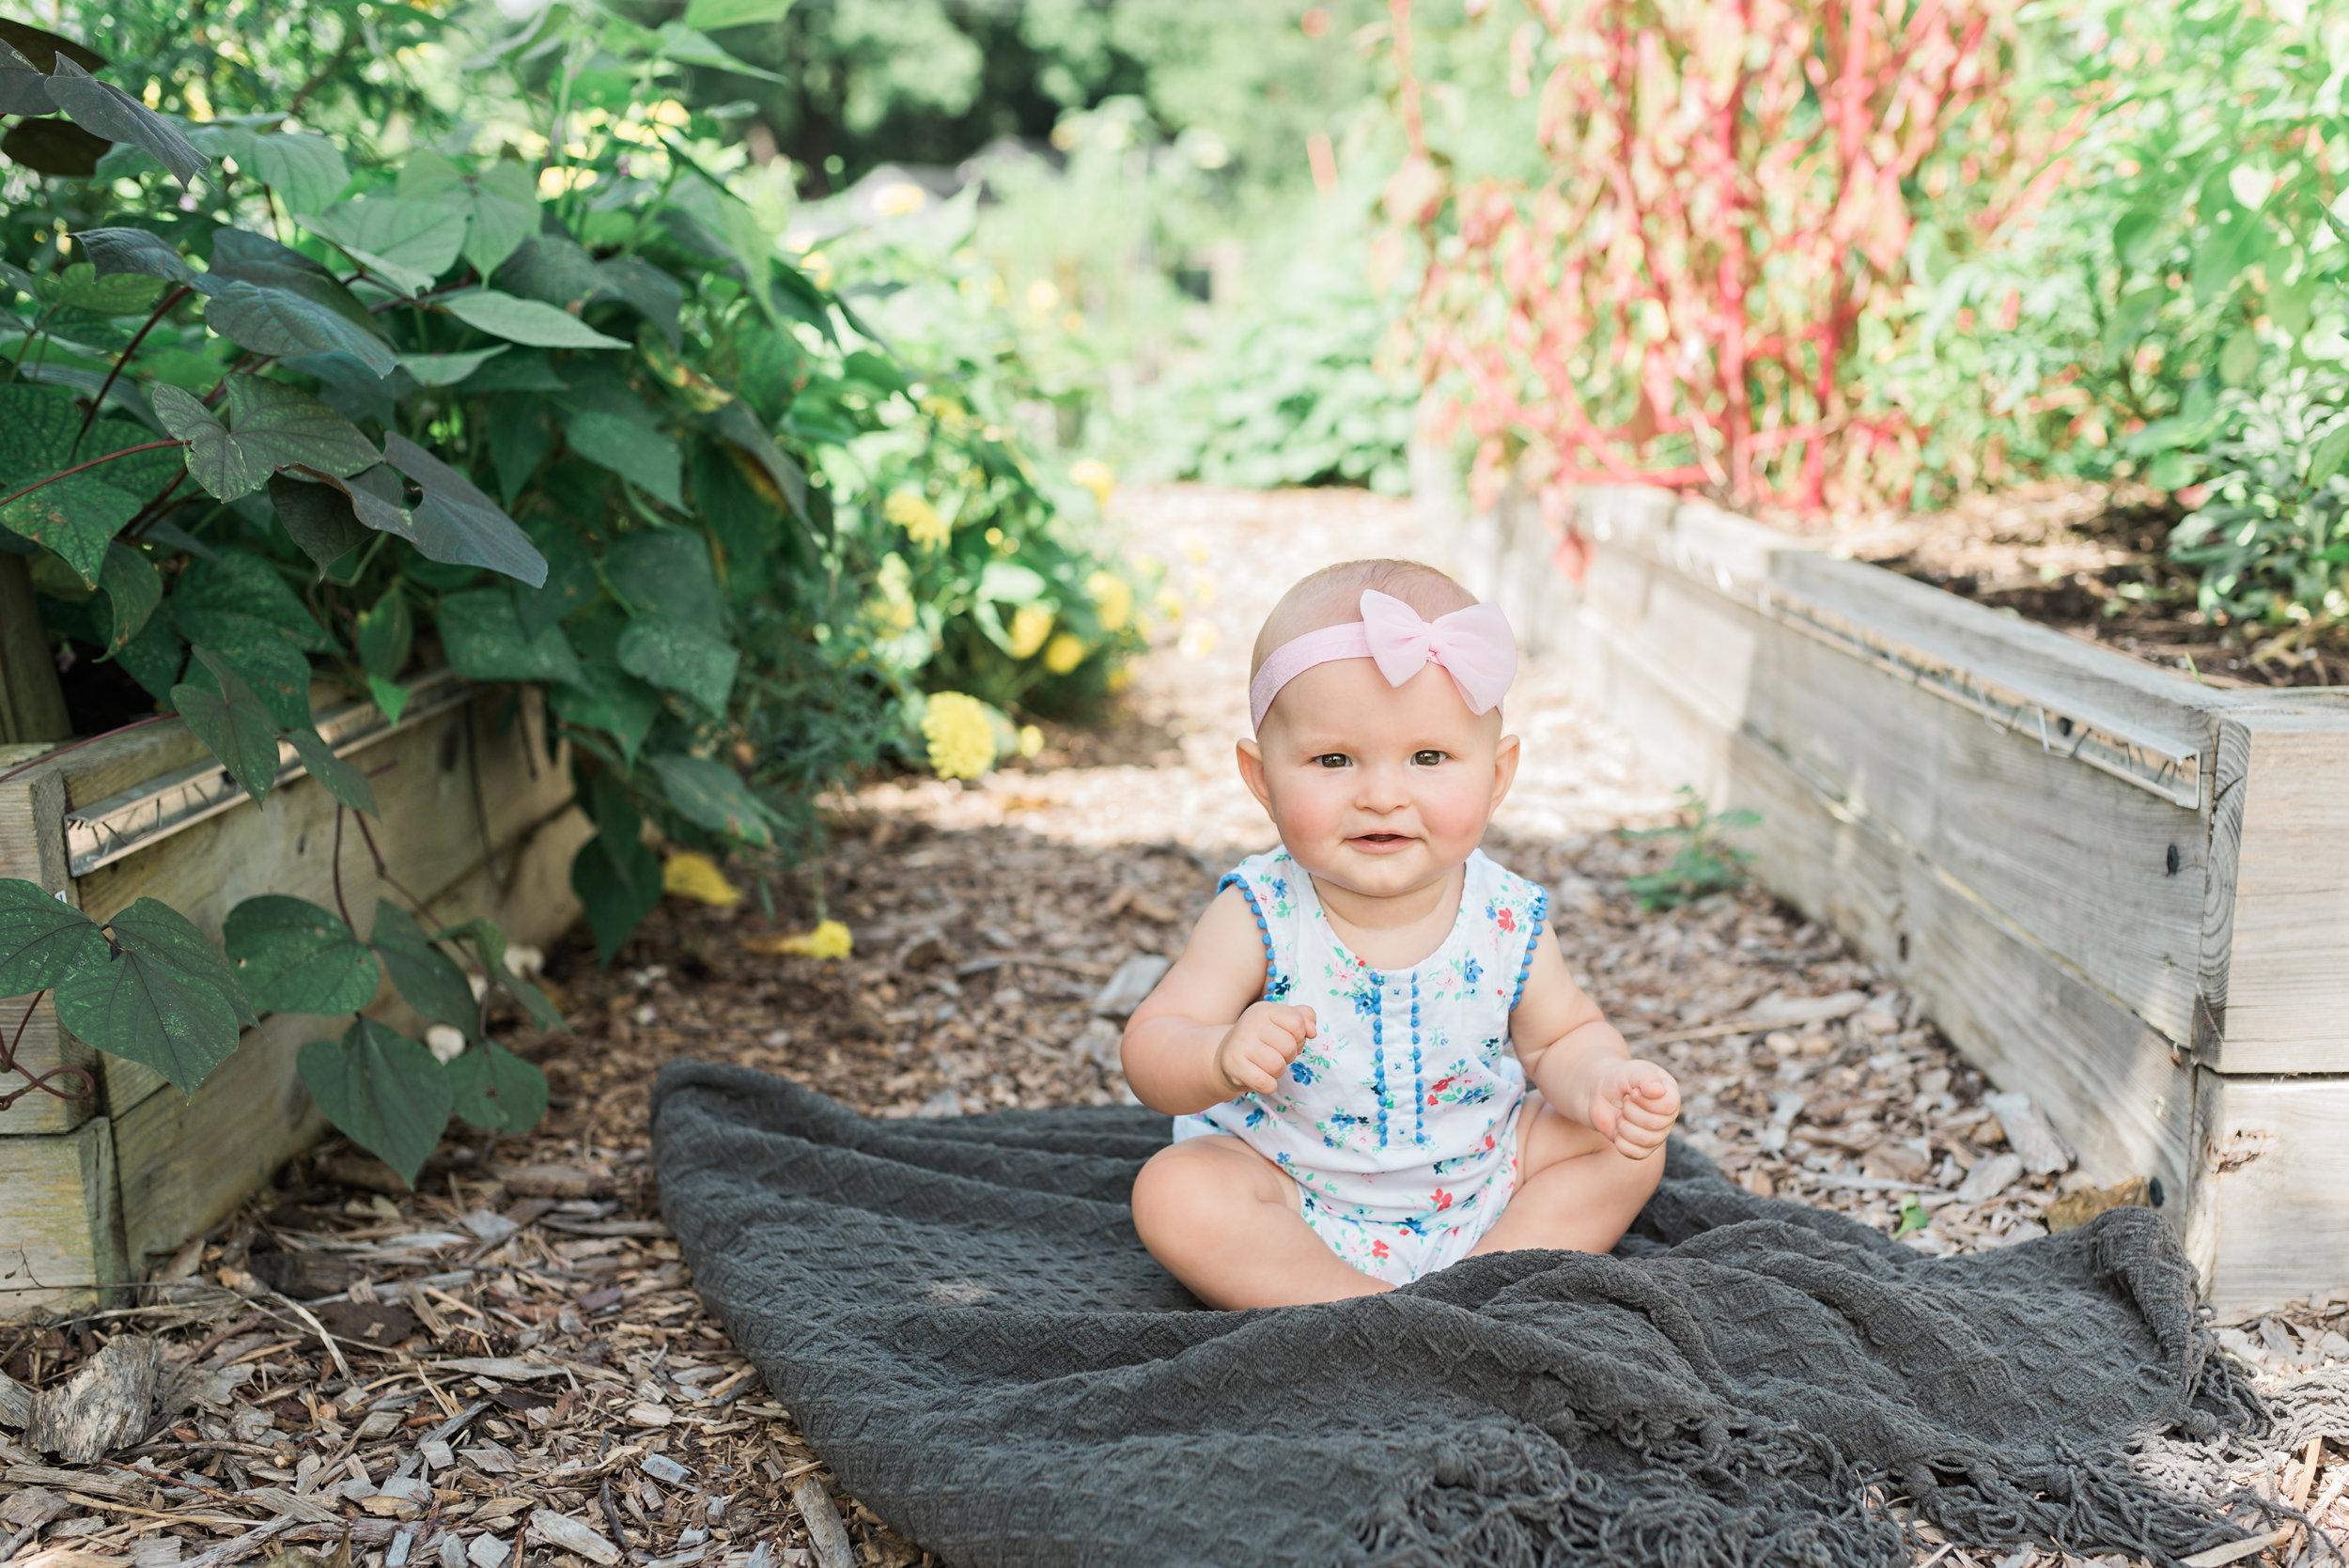 West-Ashley-Family-Photographer-Following-Seas-Photography-9974 copy.jpg